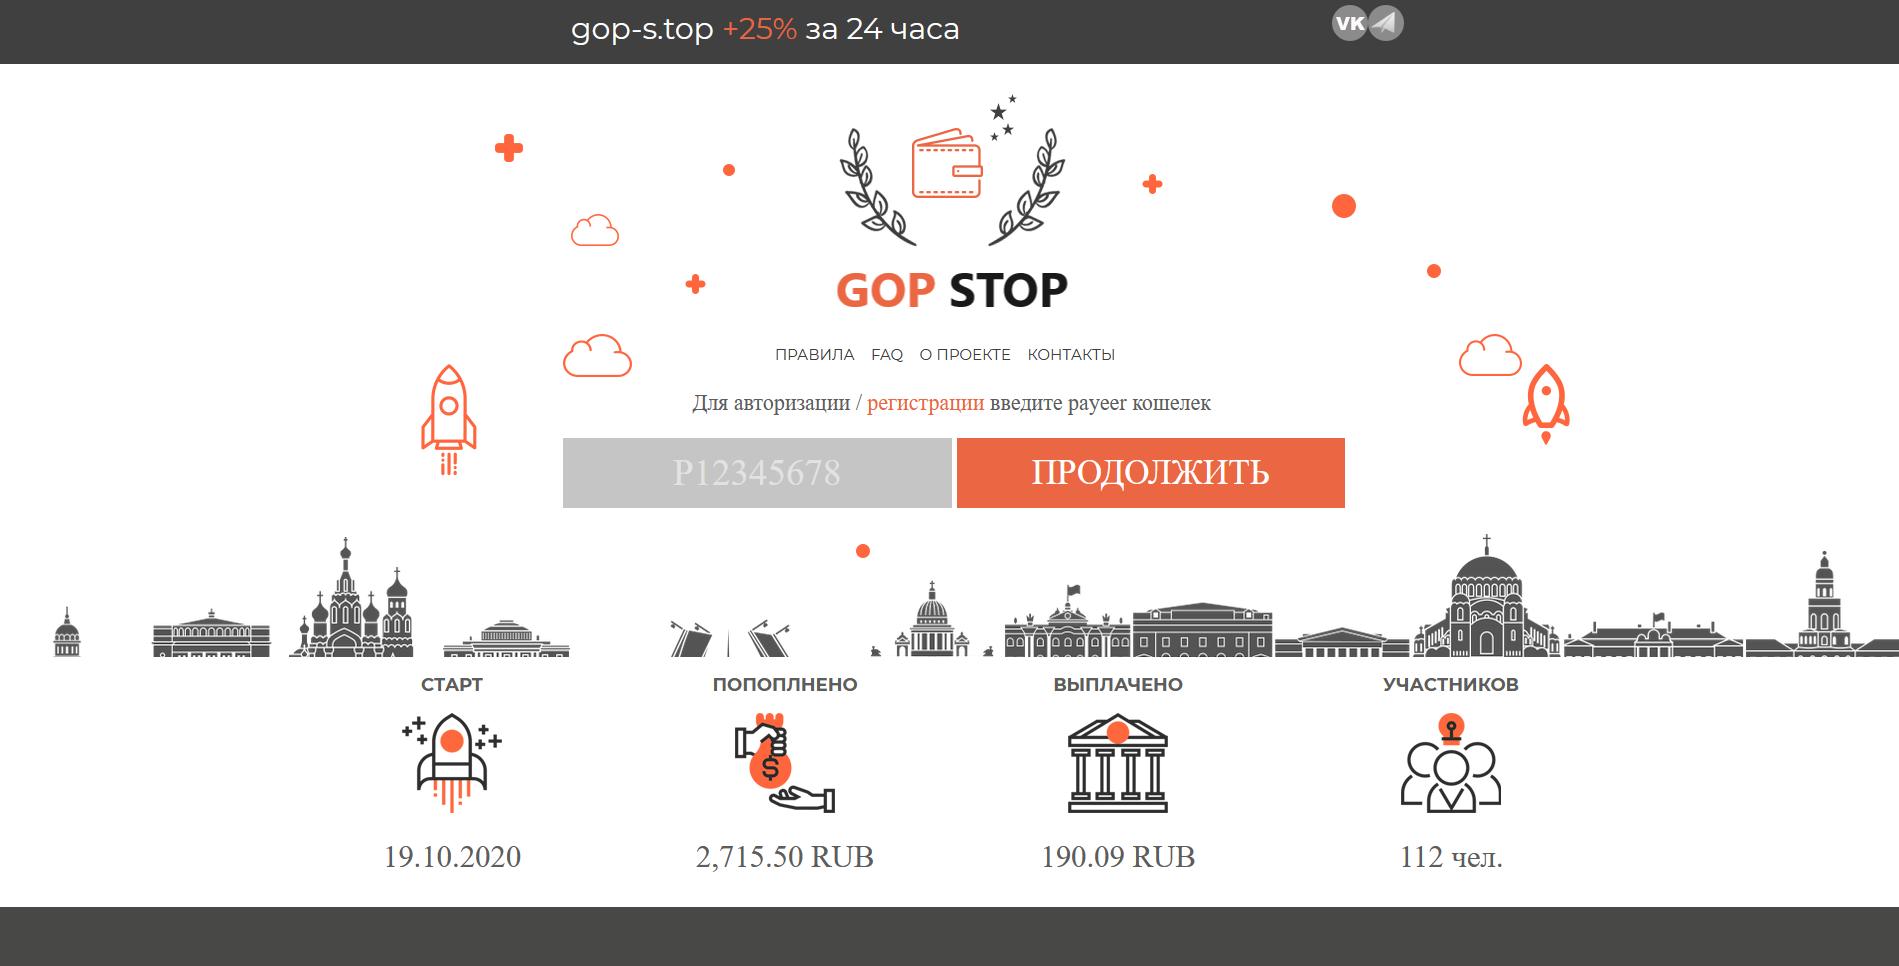 gop-stop